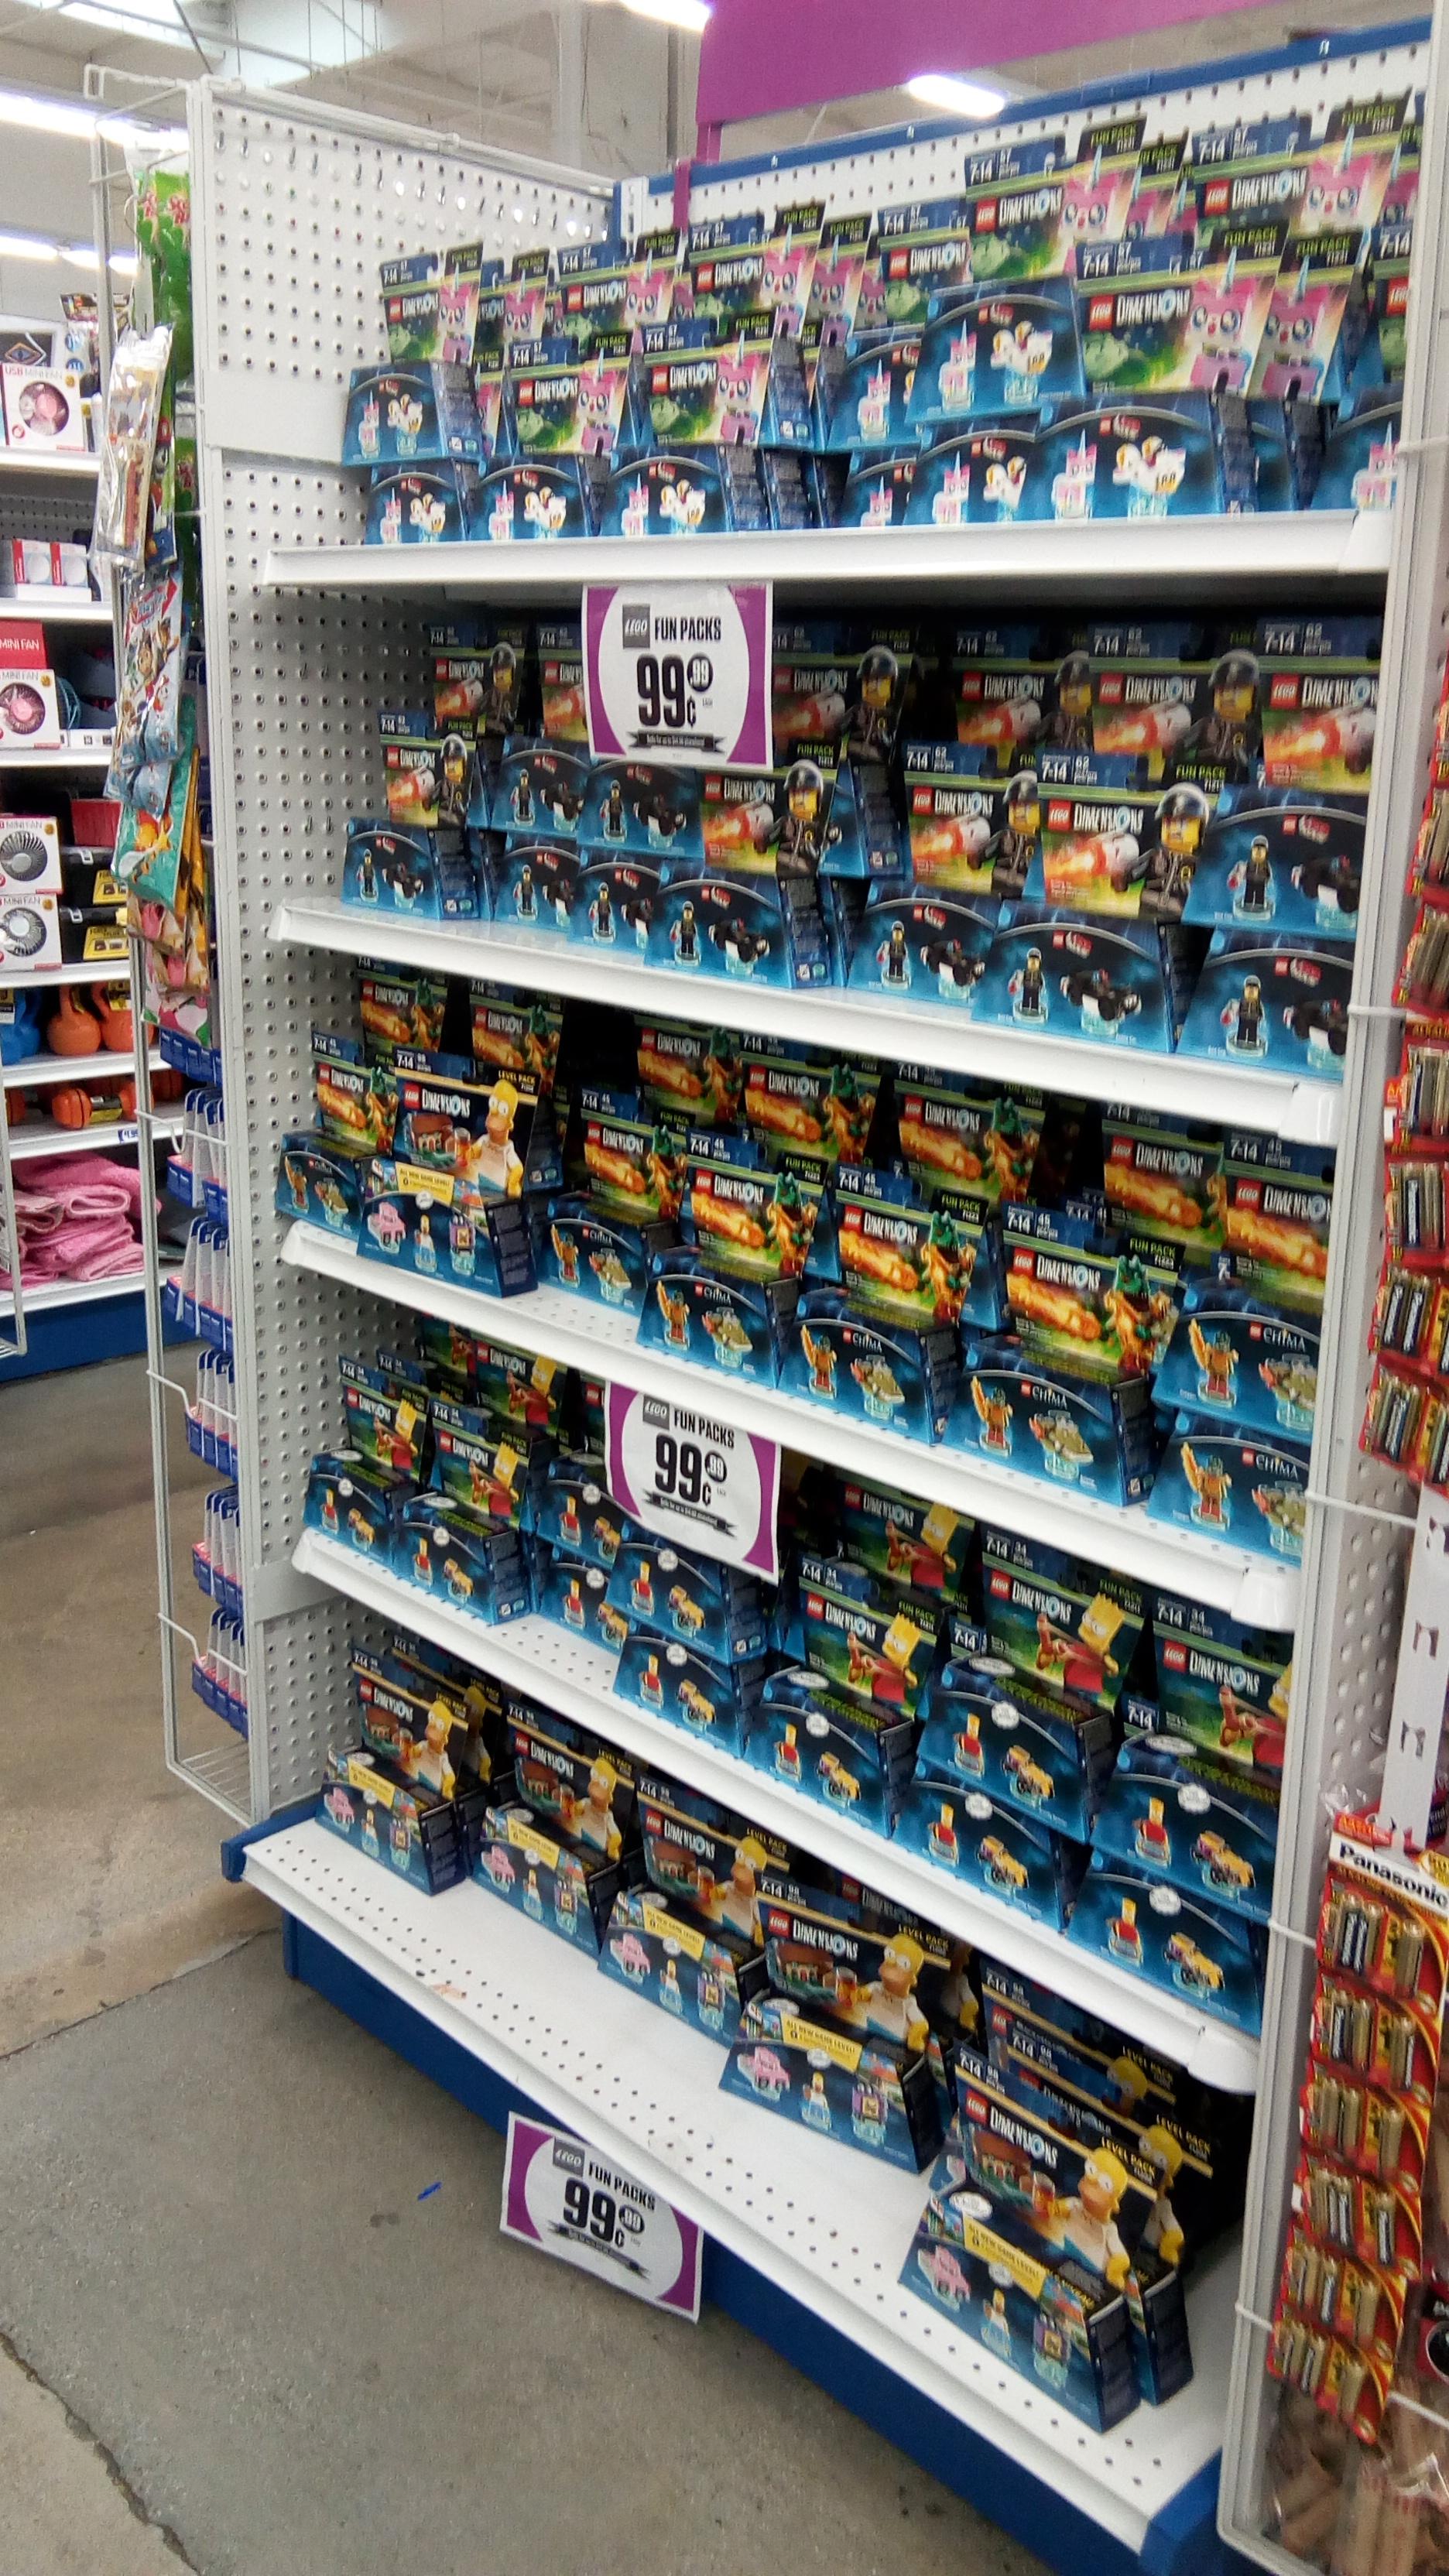 A Few LEGO Dimensions Models 34 62 Pcs Each 1 99c Only Stores Ymmv Bm CA NV TX AZ